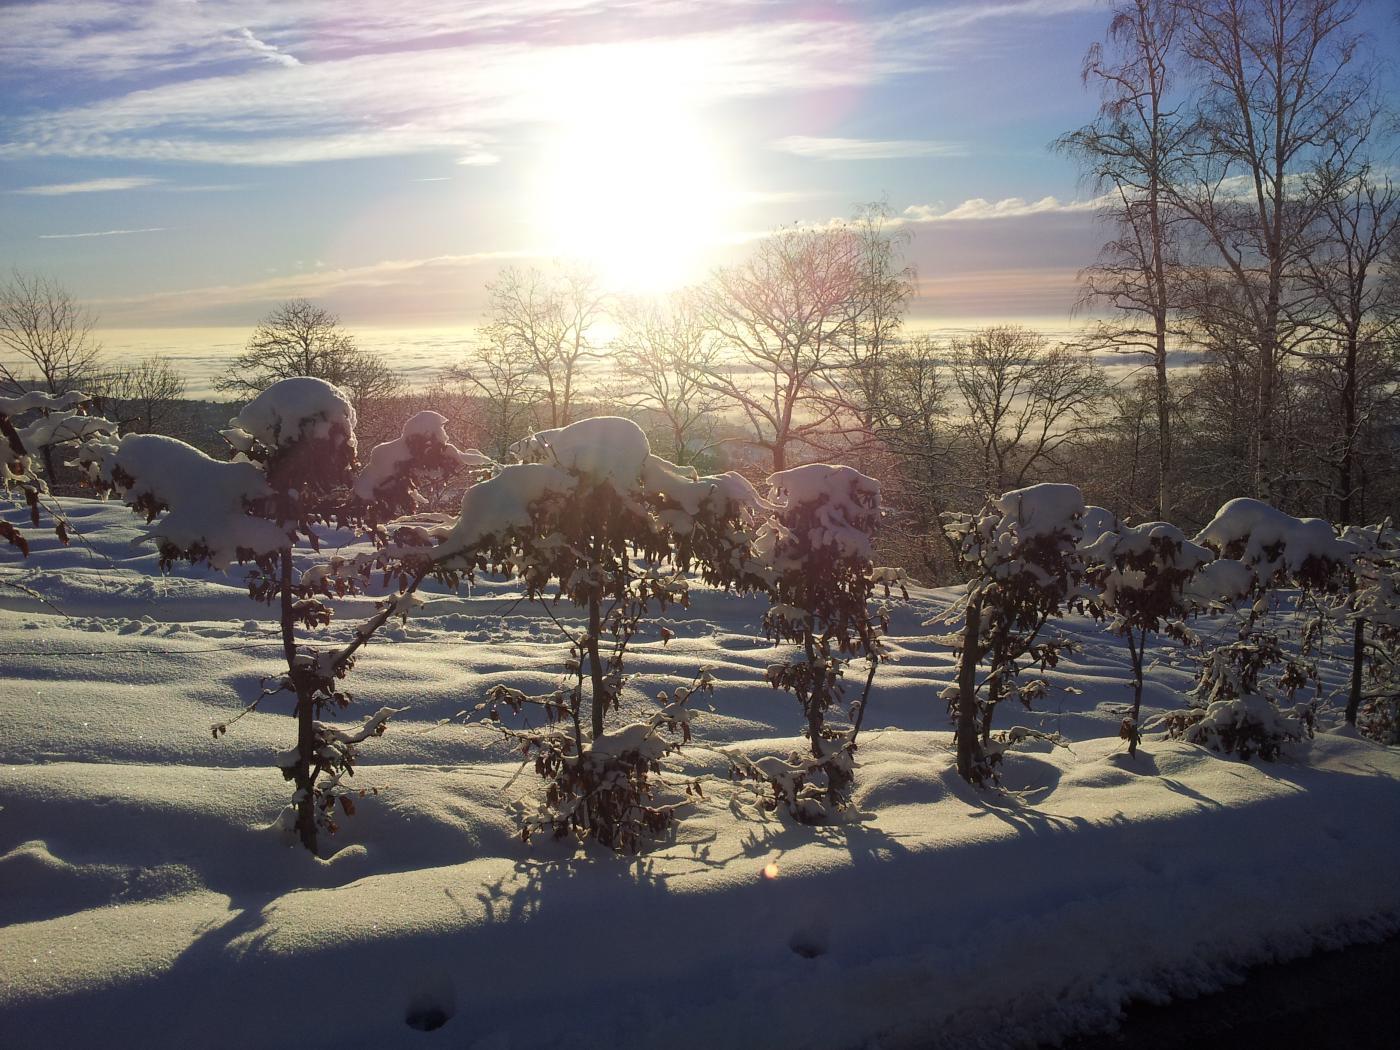 Neve recente ovunque